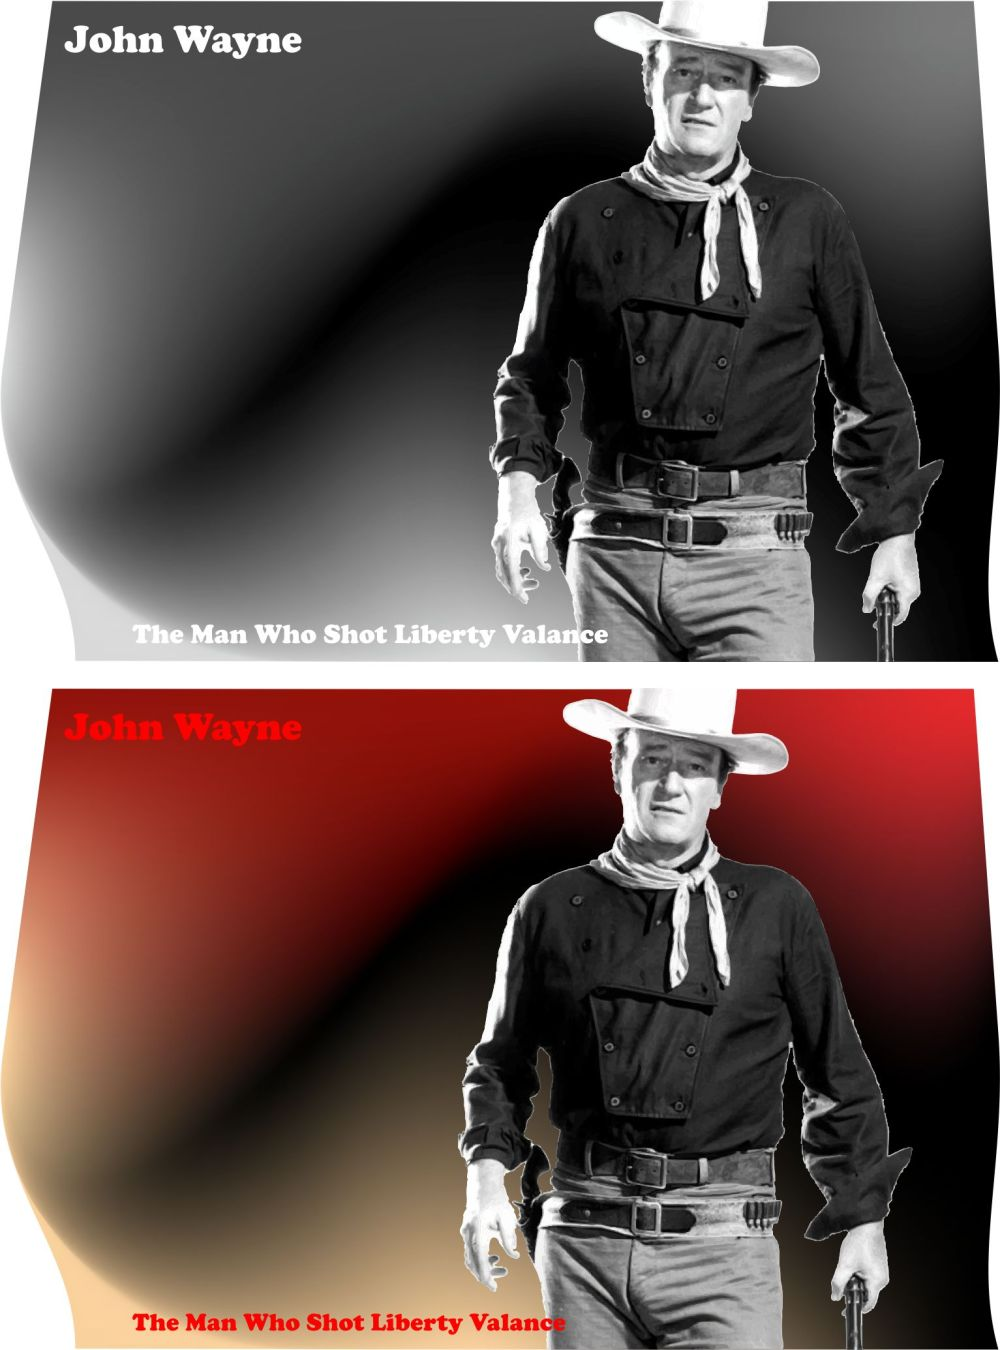 The Man Who Shot Liberty Valance - John Wayne